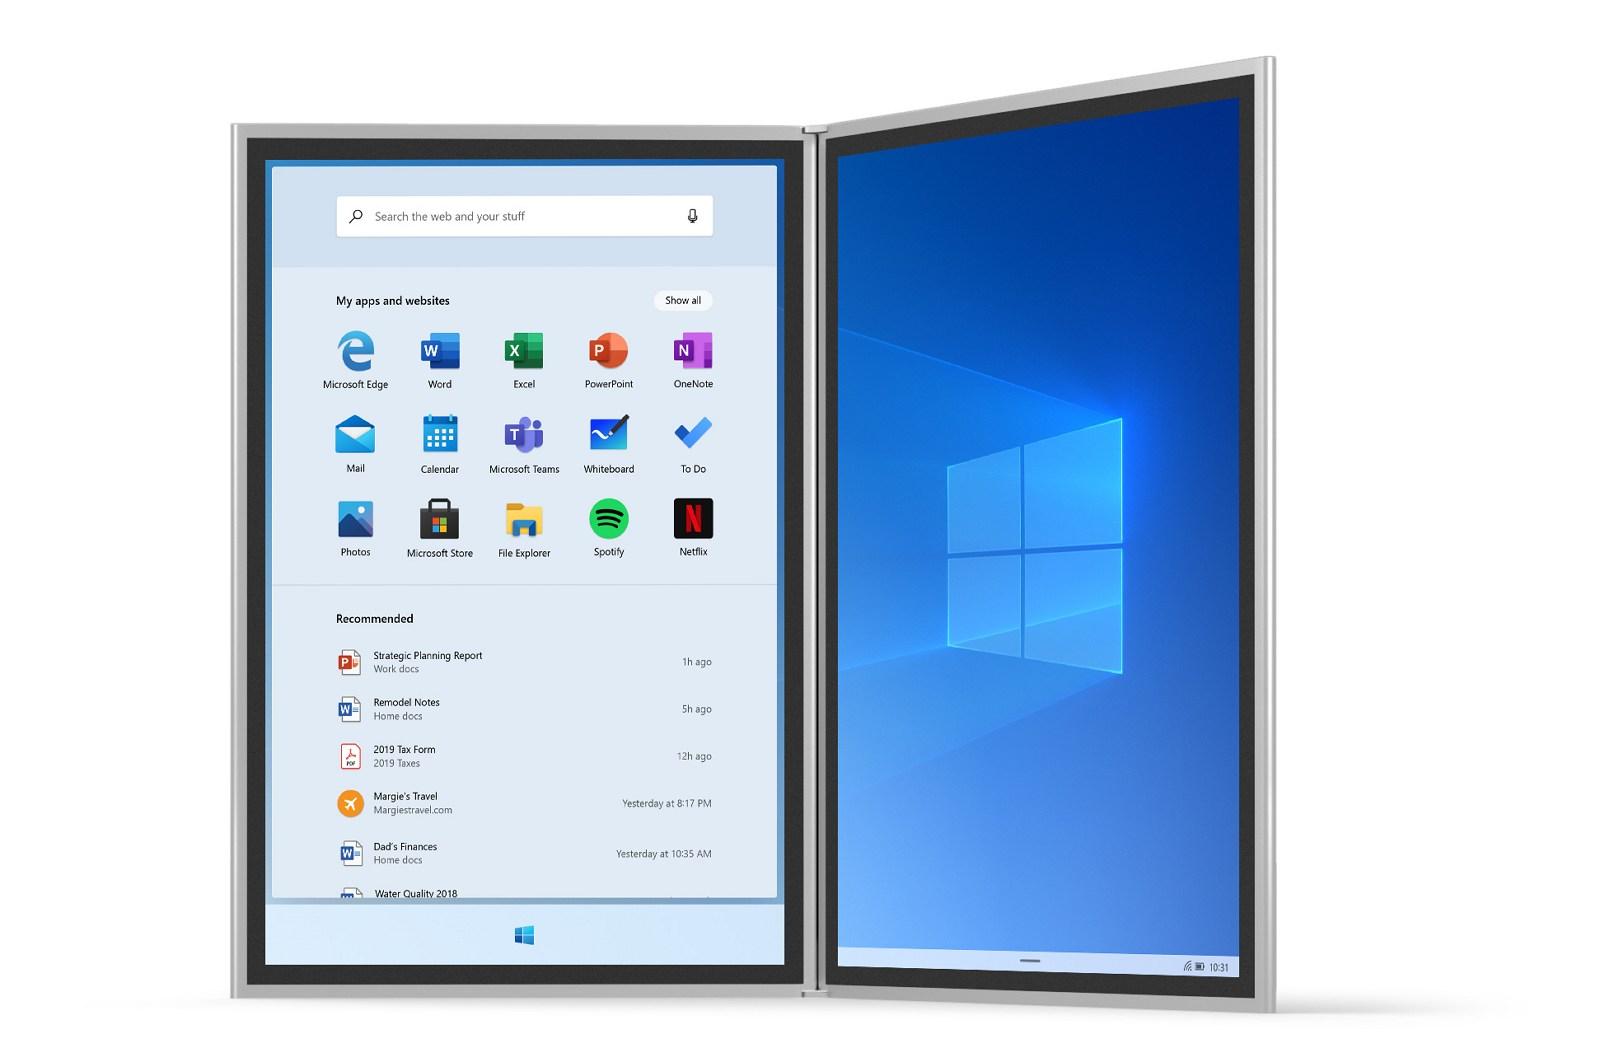 Windows 10X interface (image source Microsoft)